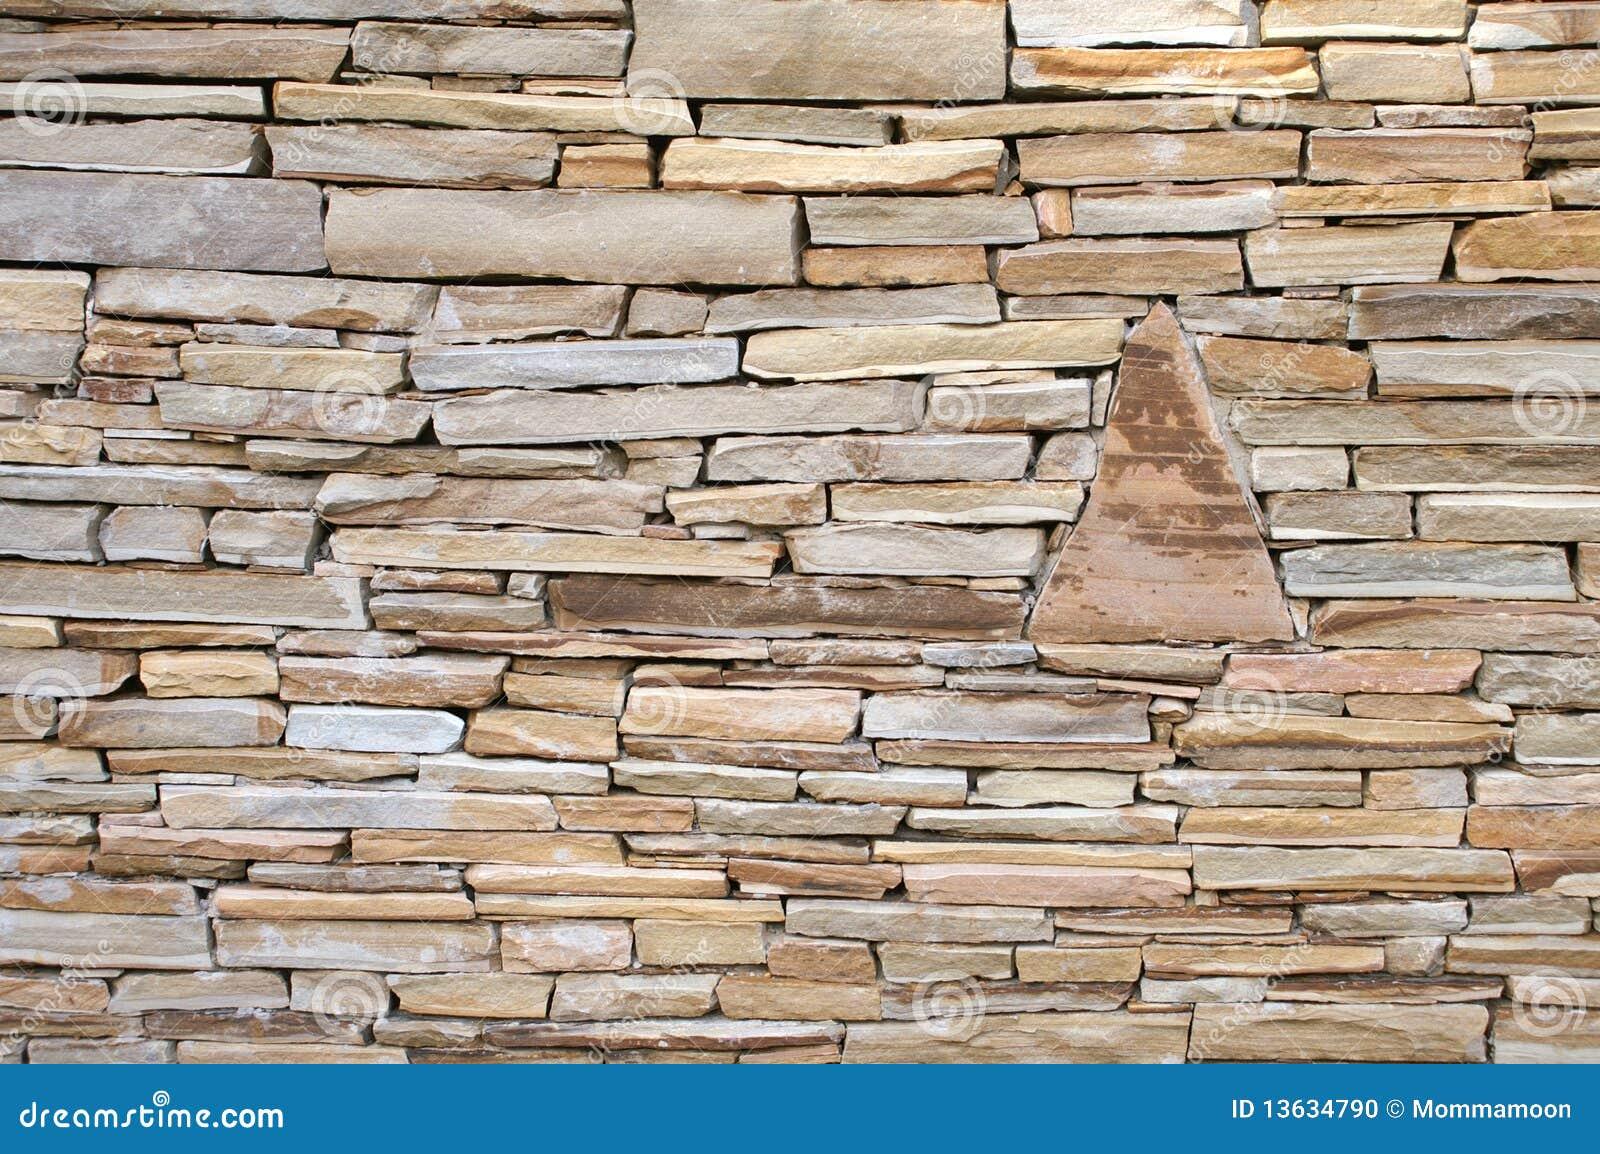 Flat Rock Stone : Rock wall stock photo image of close rough stone